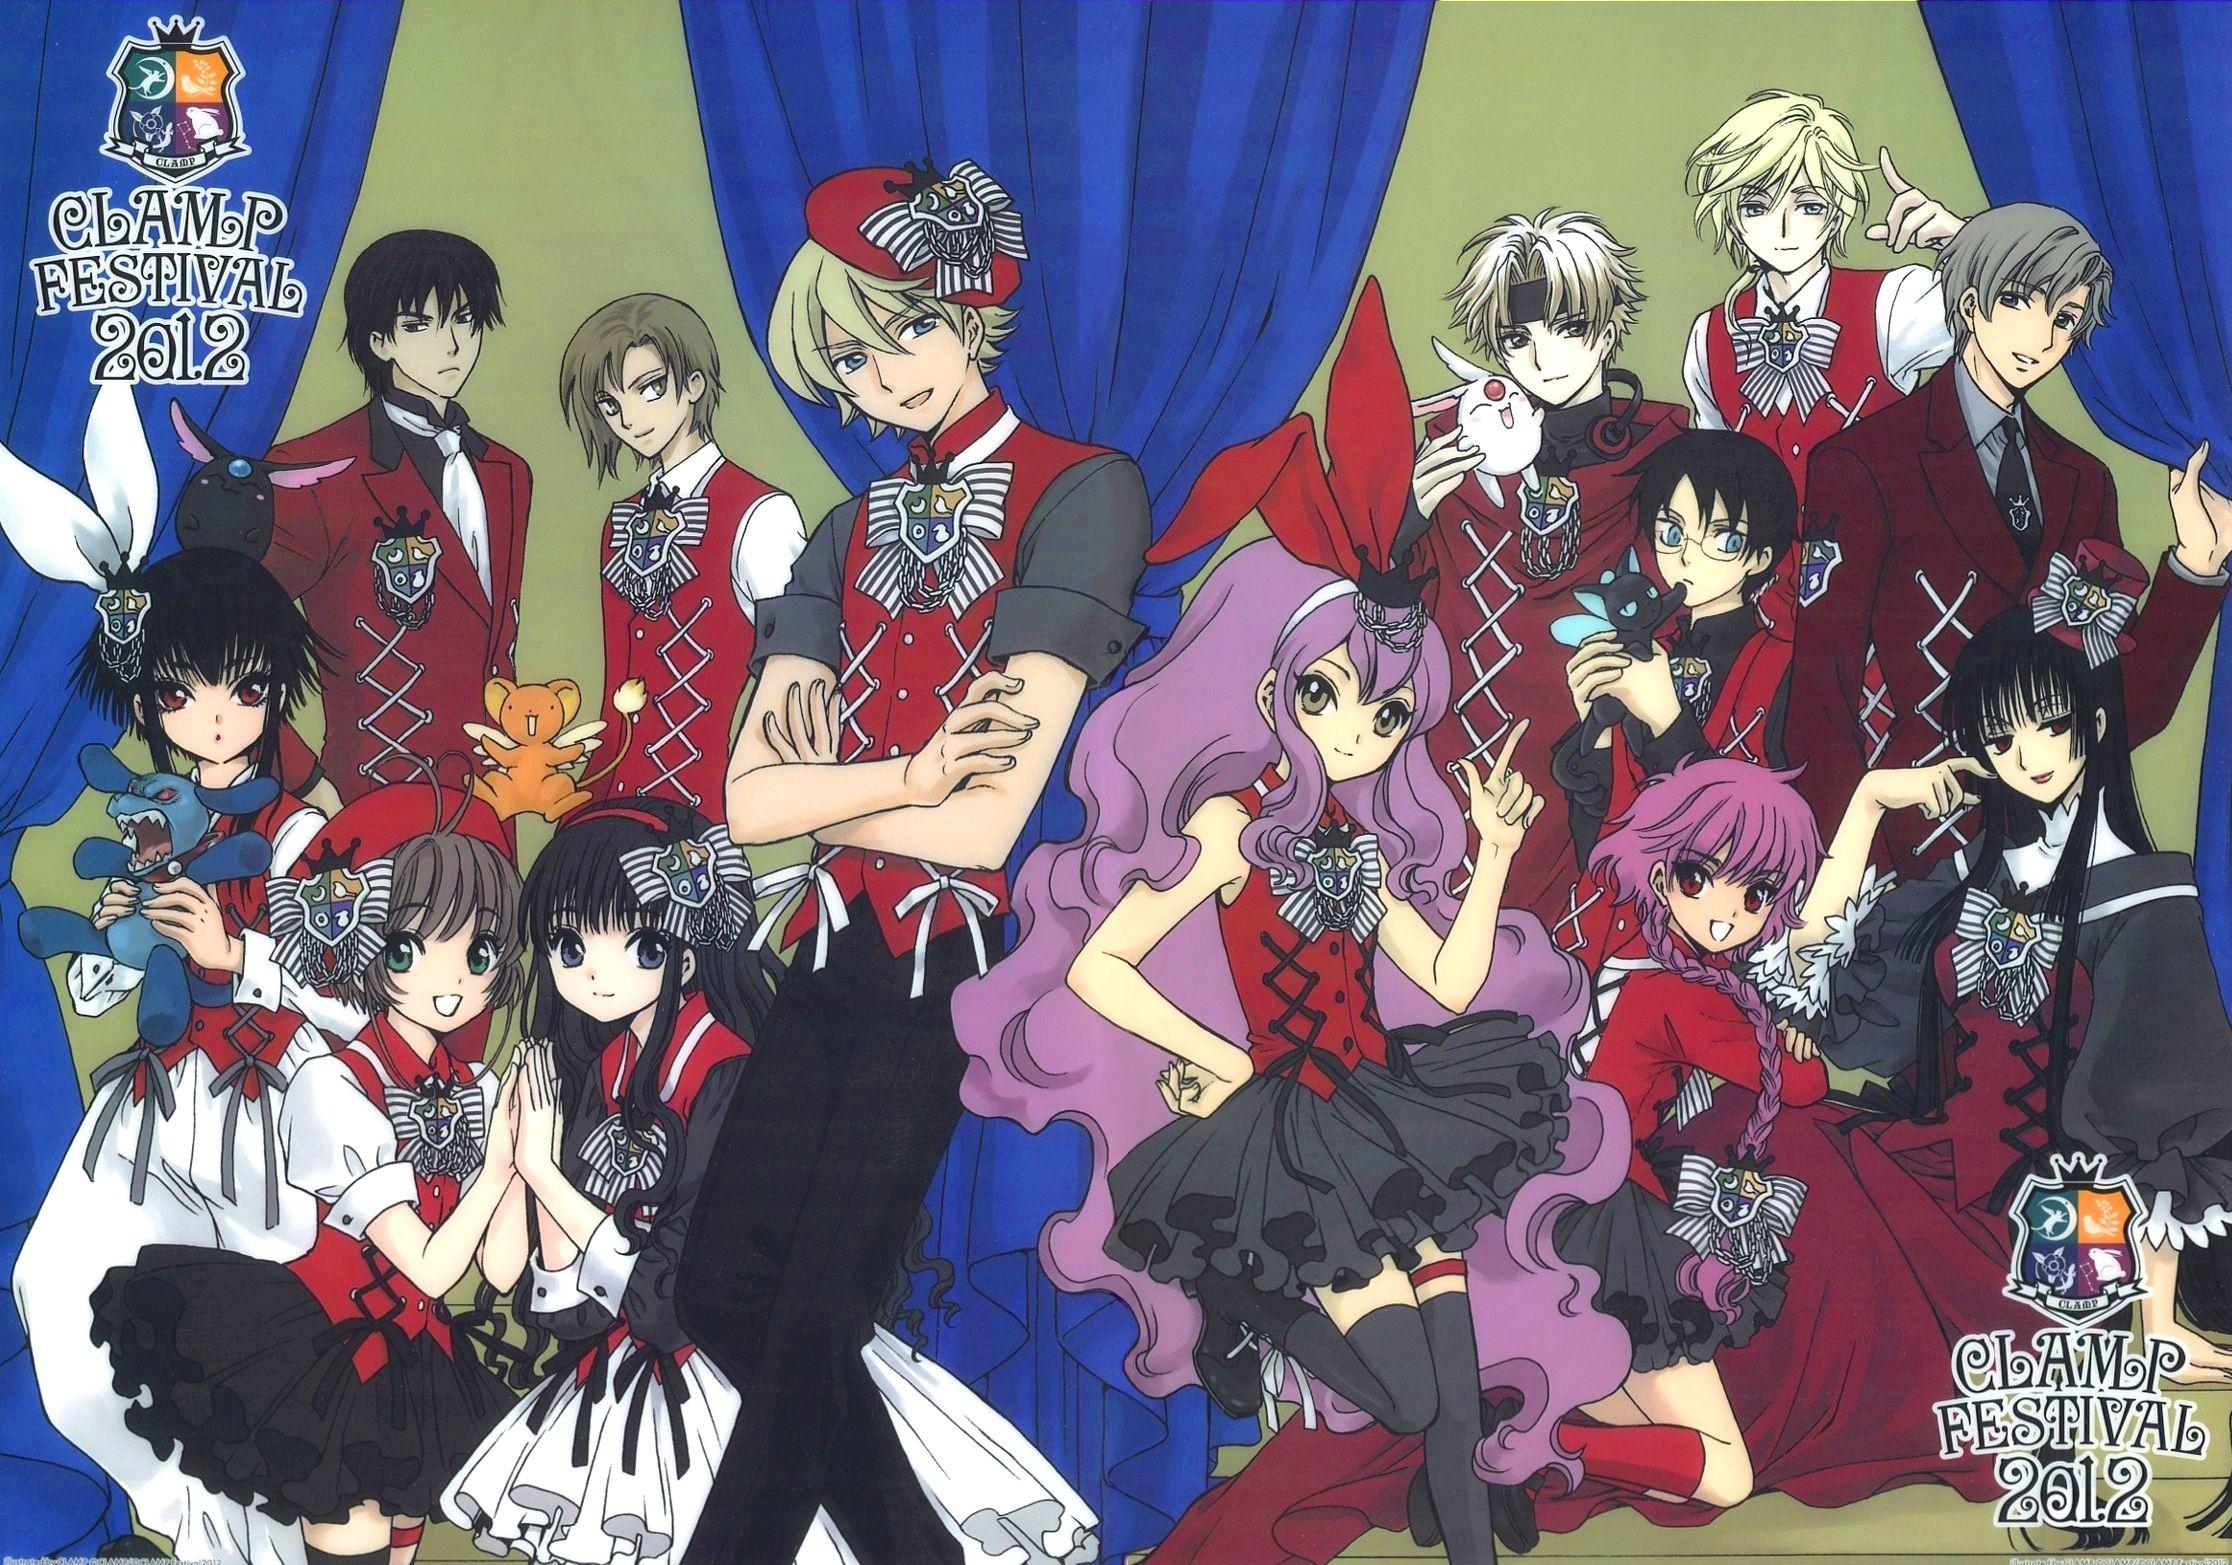 Download Crossovers (2232x1565) Minitokyo Anime